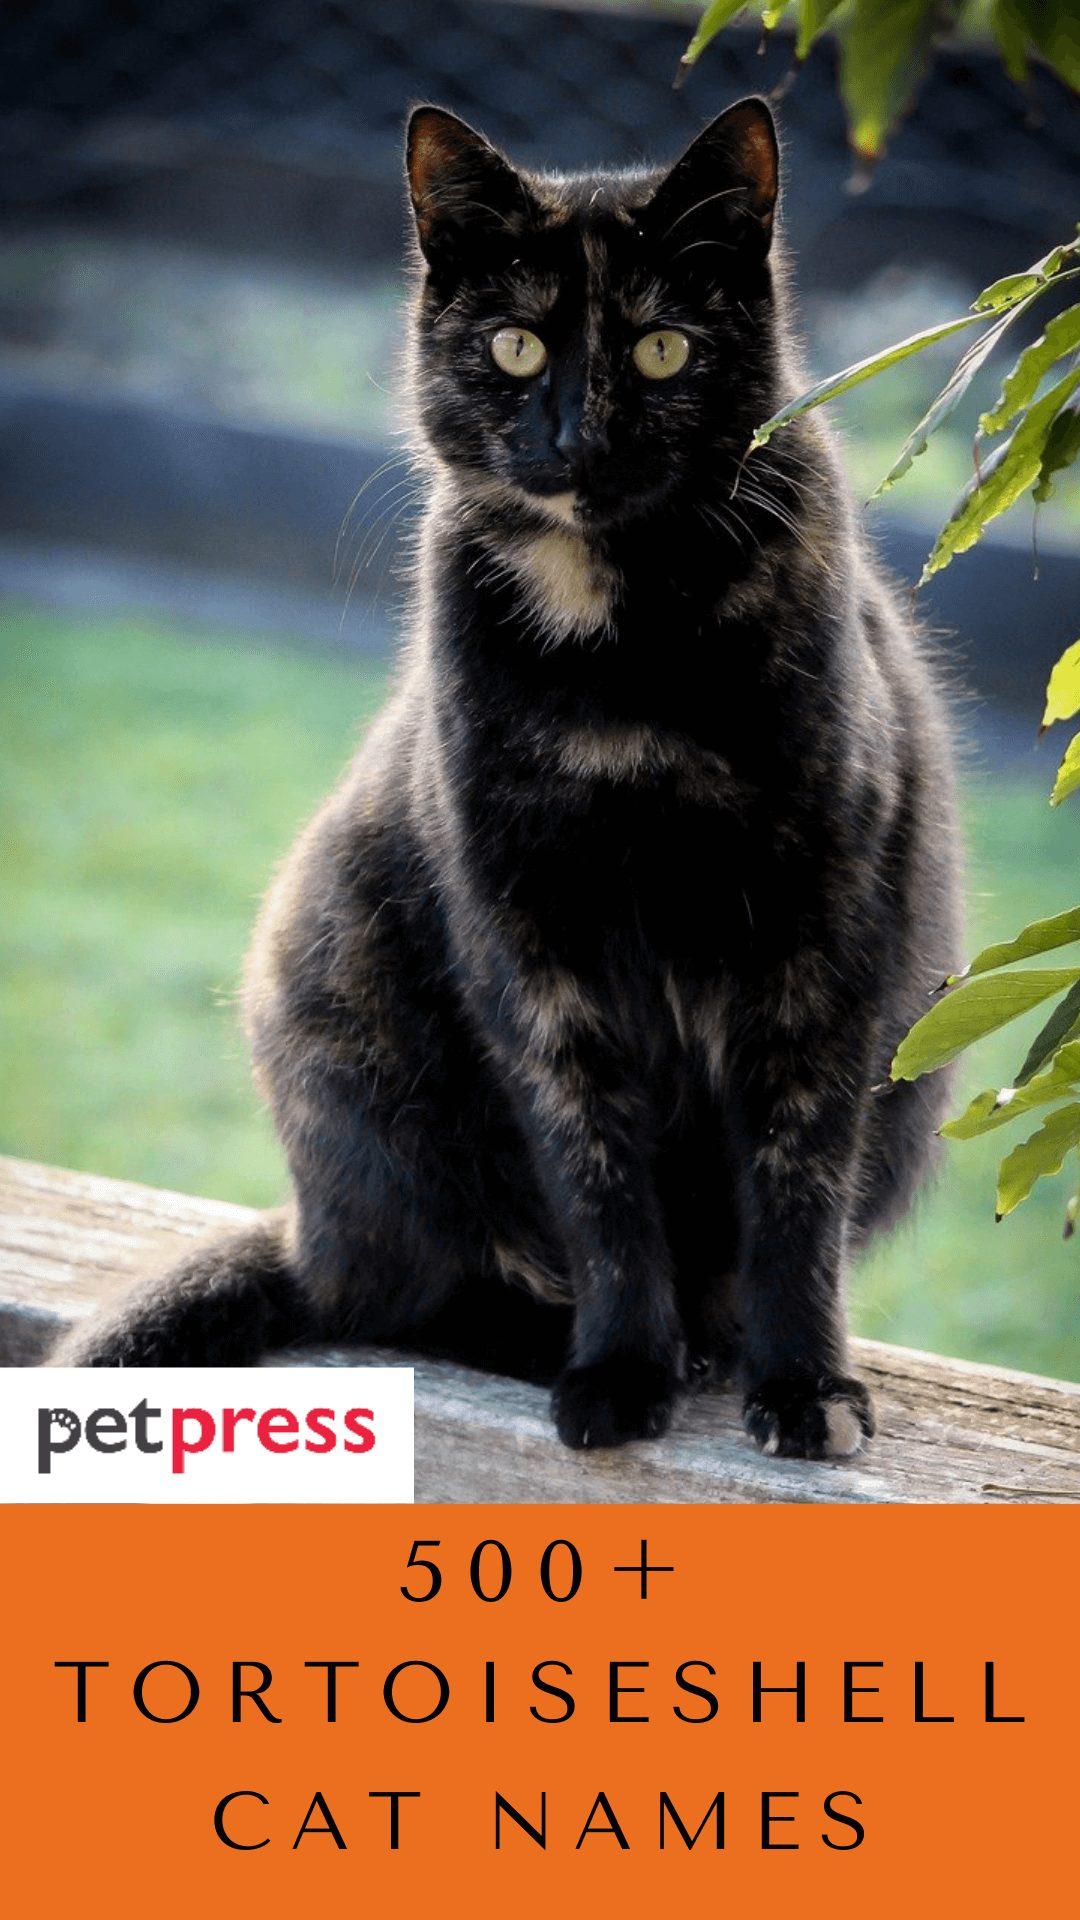 tortoiseshell-cat-names